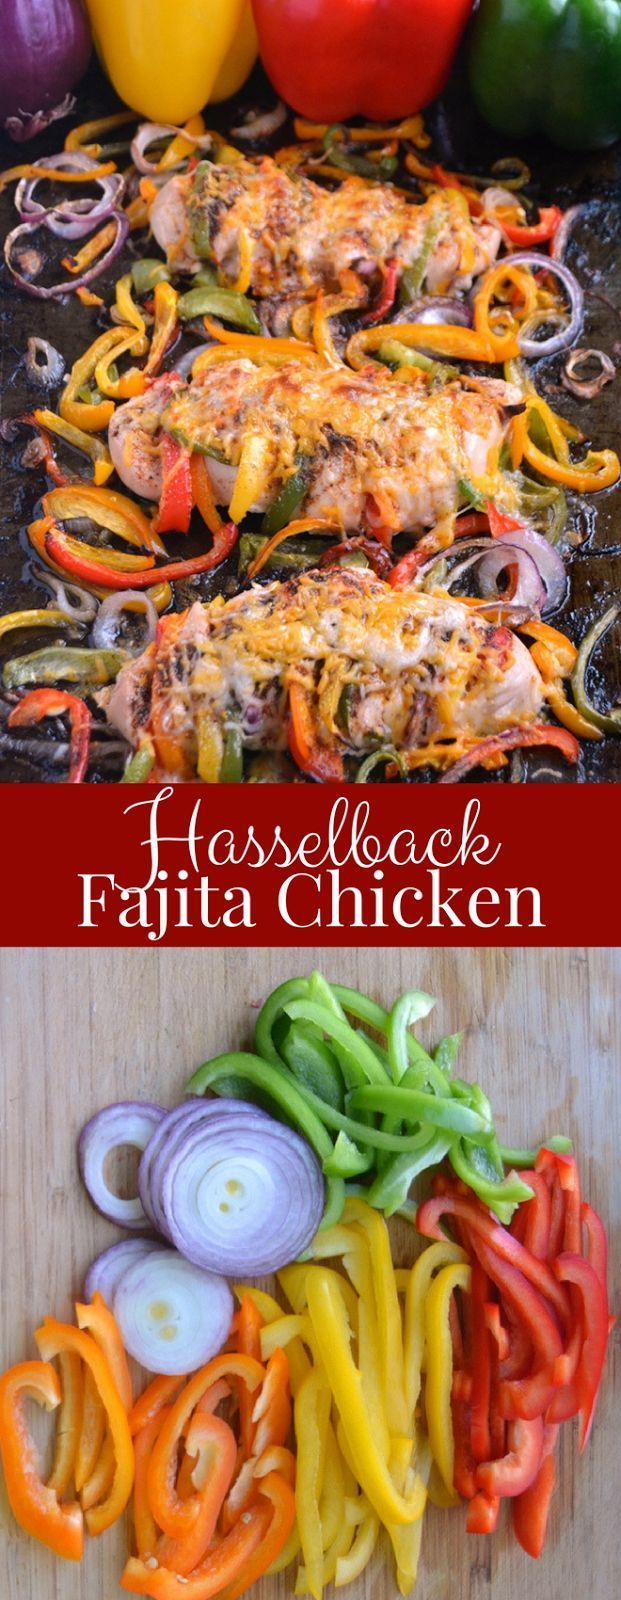 Hasselback Fajita Chicken #hasselbackchicken